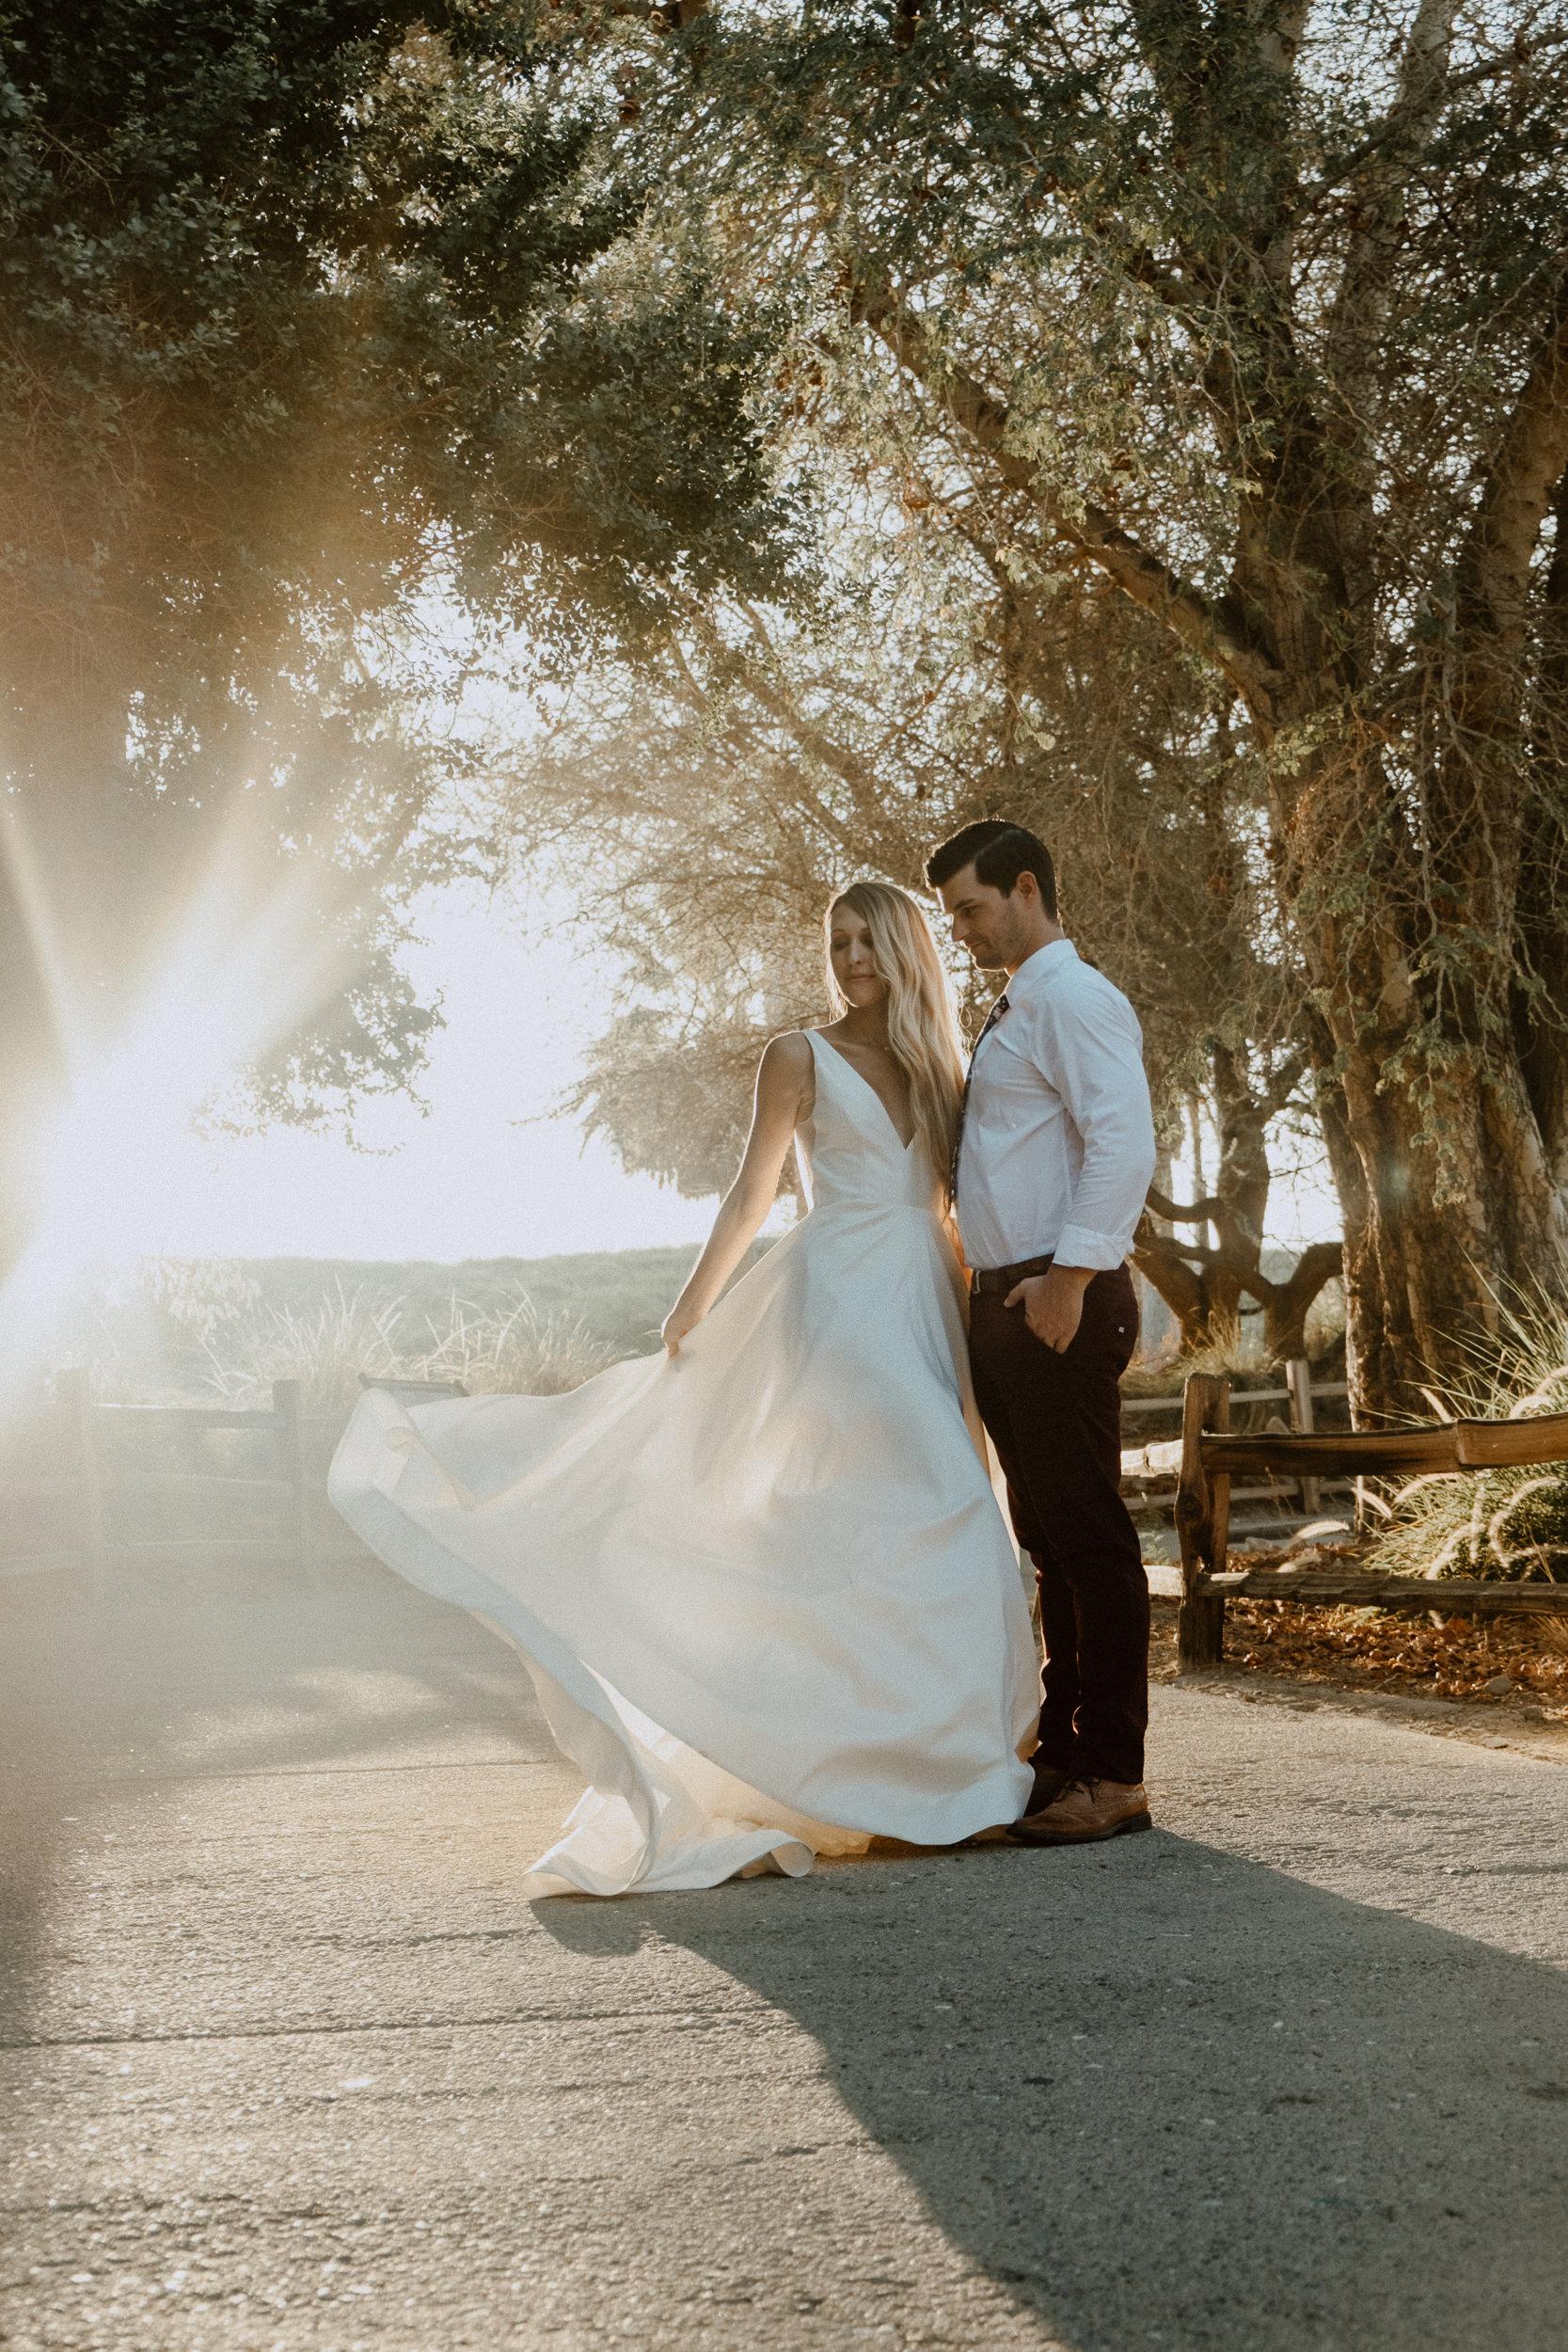 sChelsie + Chris - The Desert Shootout Wedding Romantics at The Living Desert-35.jpg